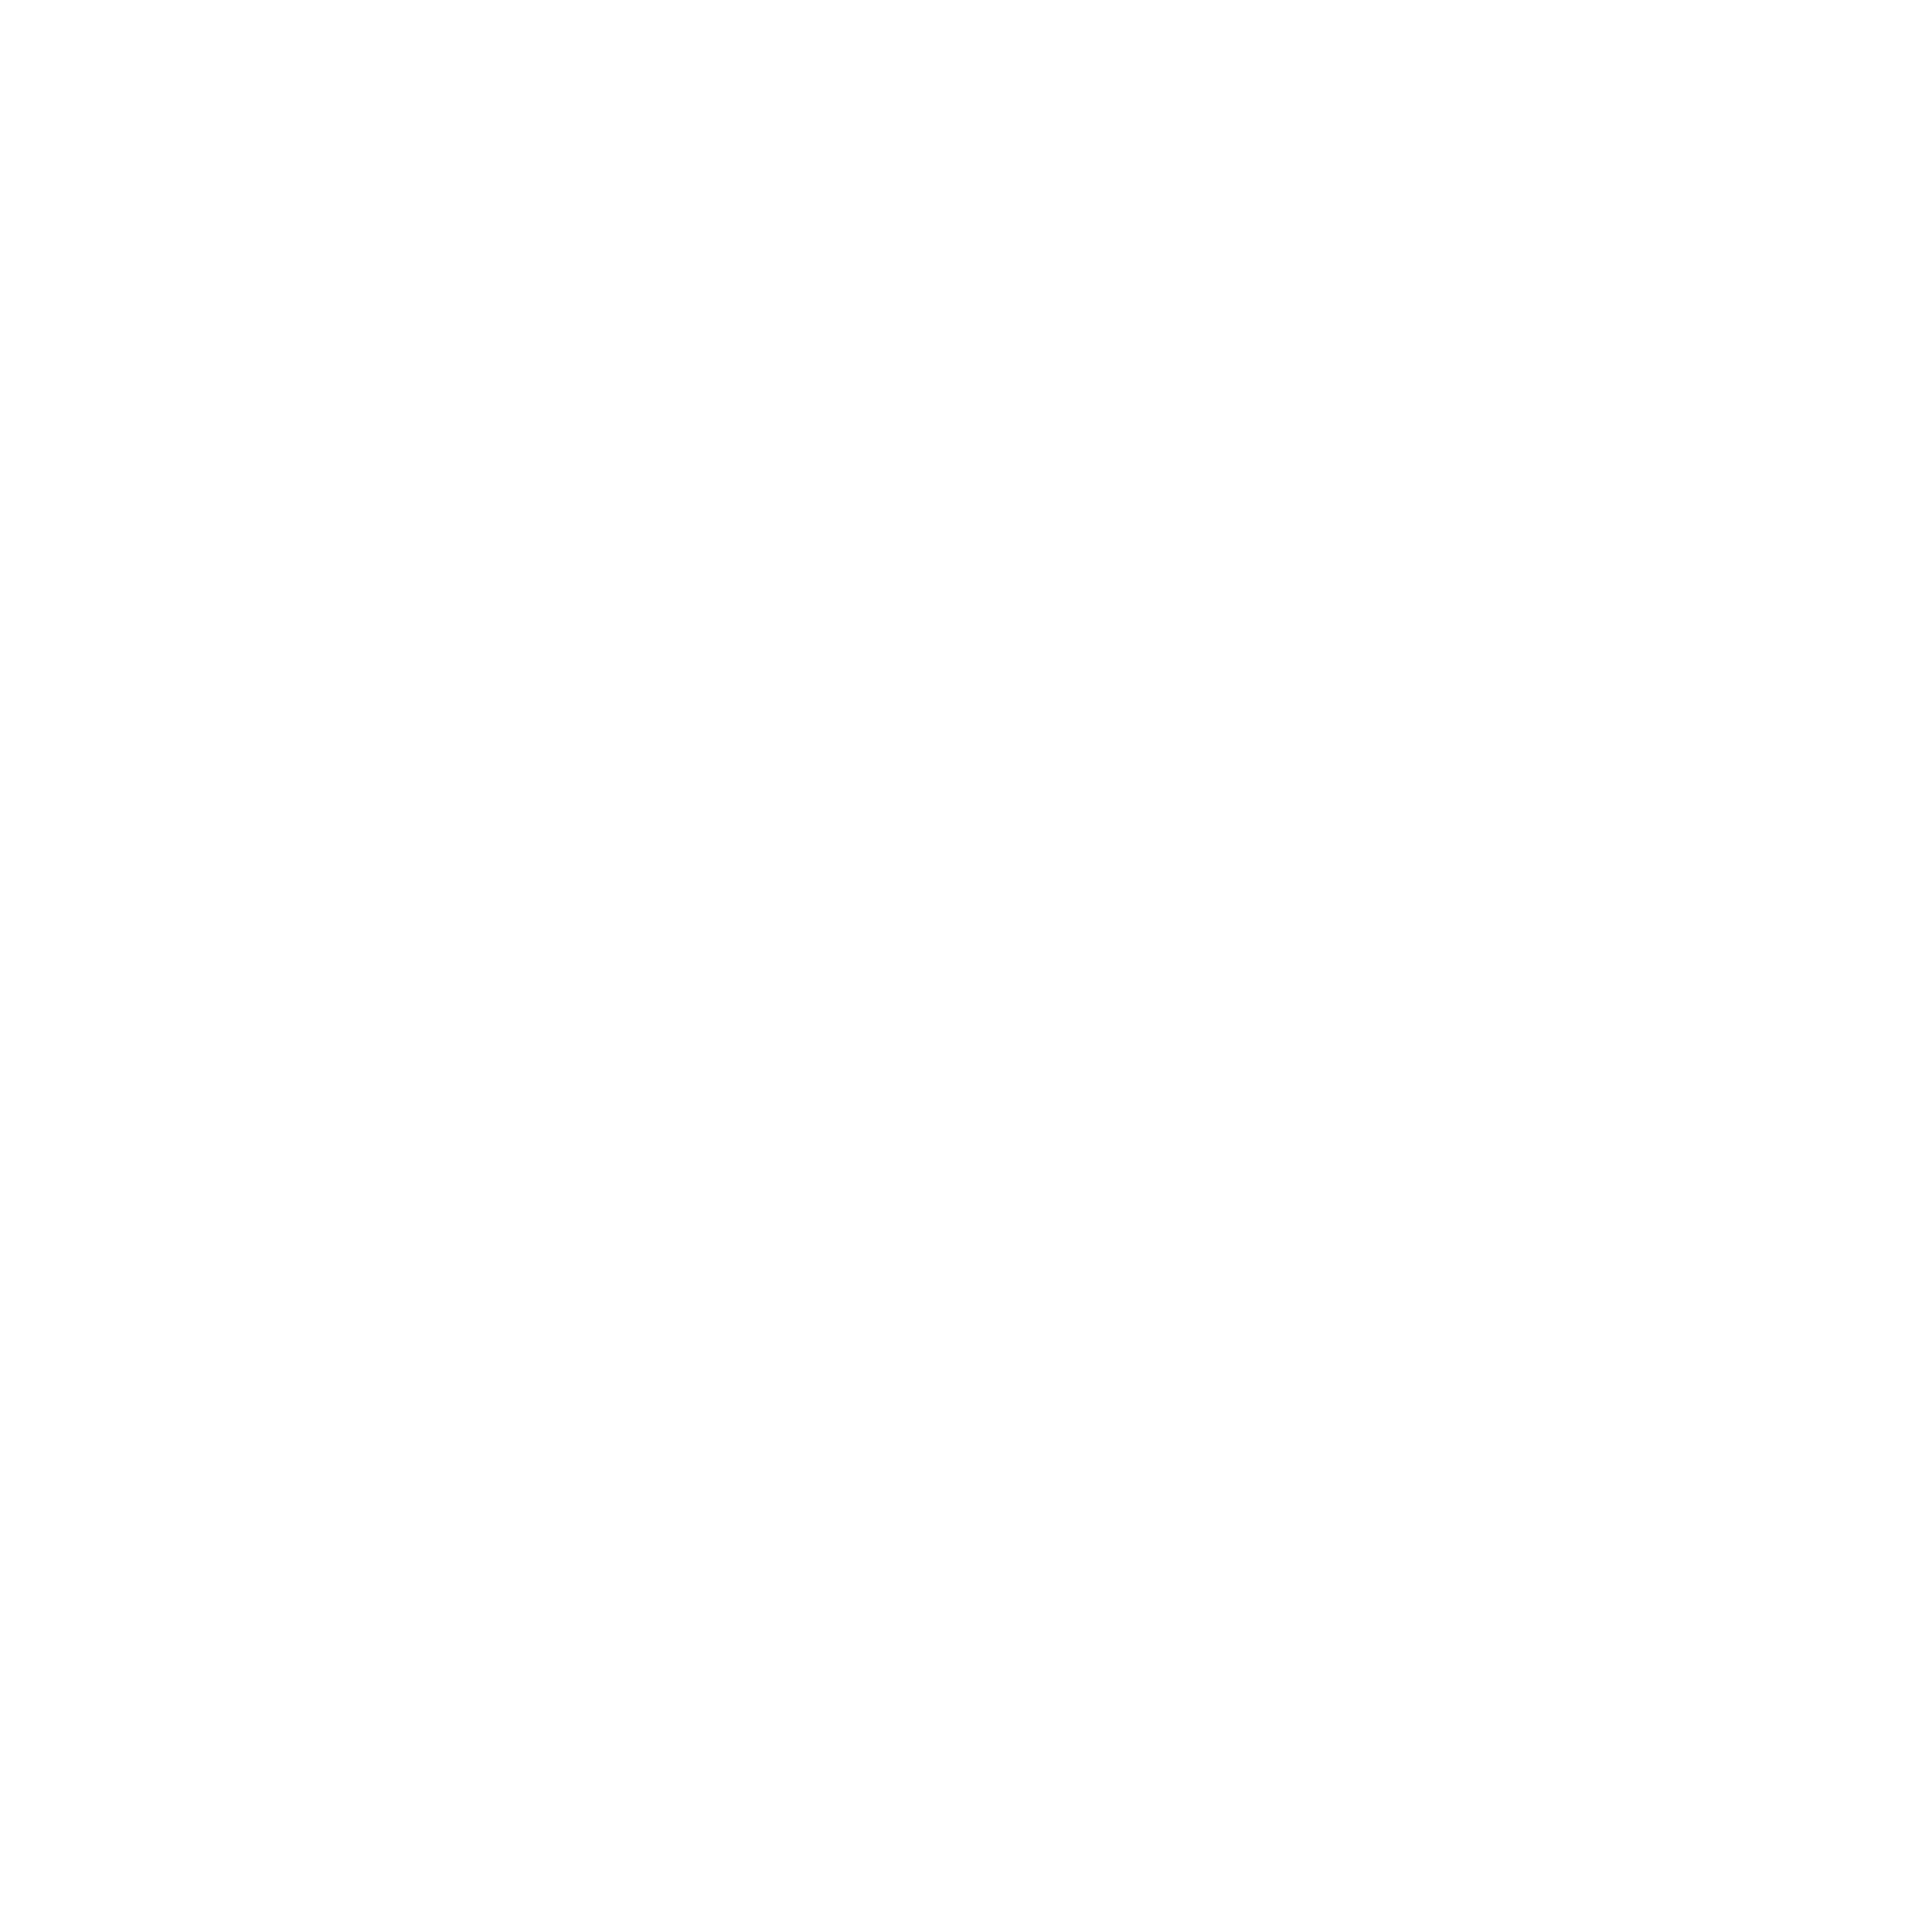 metal_match_alt_2_wht.png